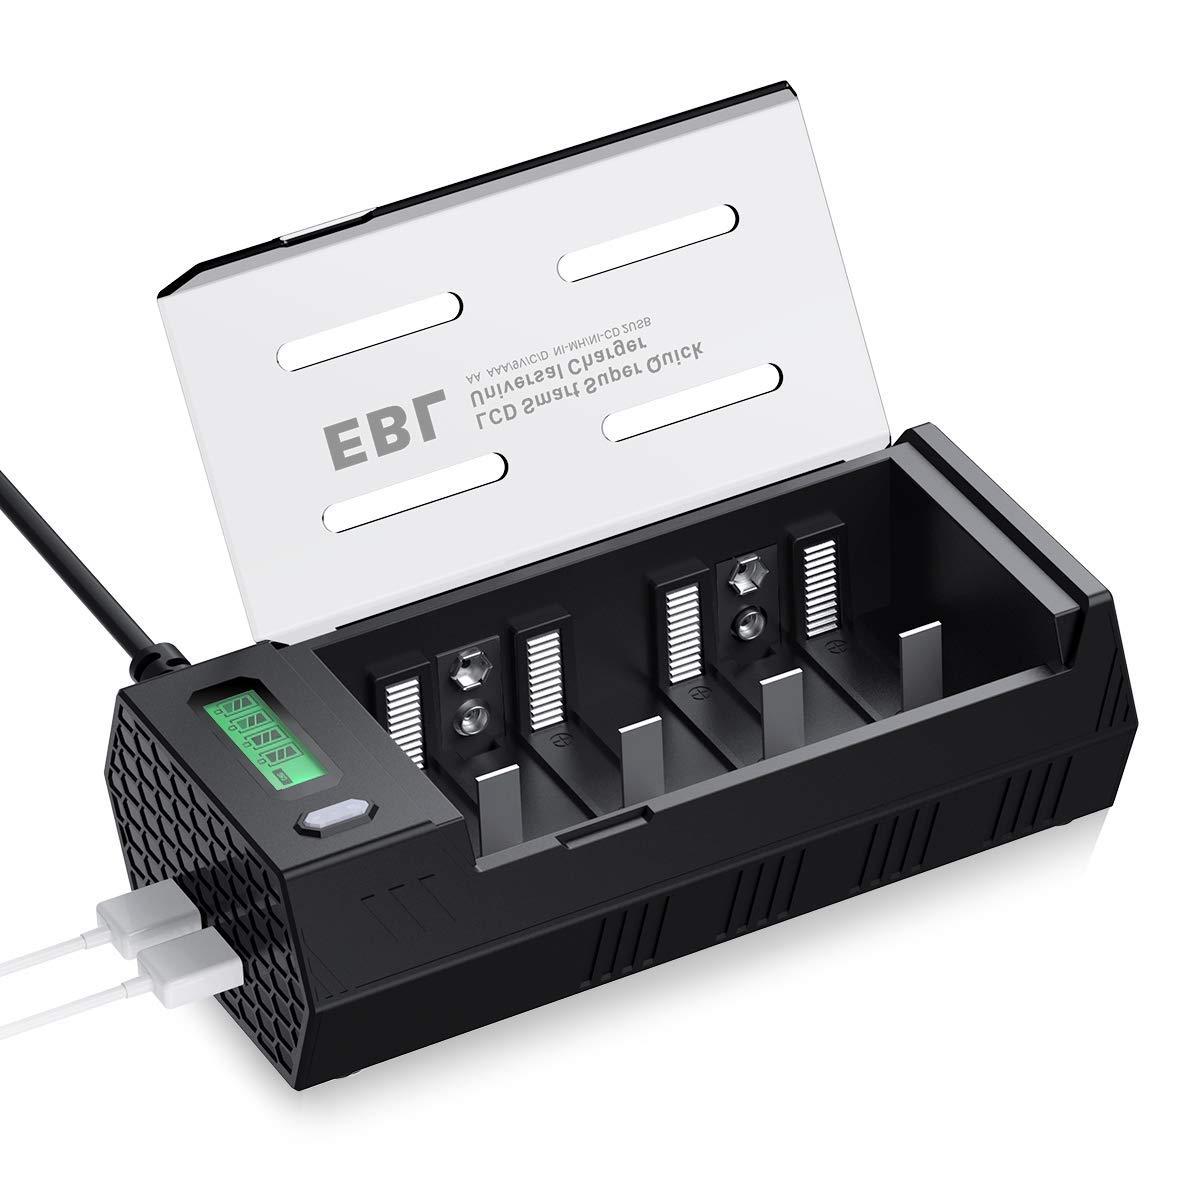 EBL 908 Cargador de Pilas para AA AAA C D 9V Ni-MH Ni-CD Pilas Recargables con 2 Puertos de USB, Pantalla LCD Inteligente y Función de Descarga: Amazon.es: Electrónica